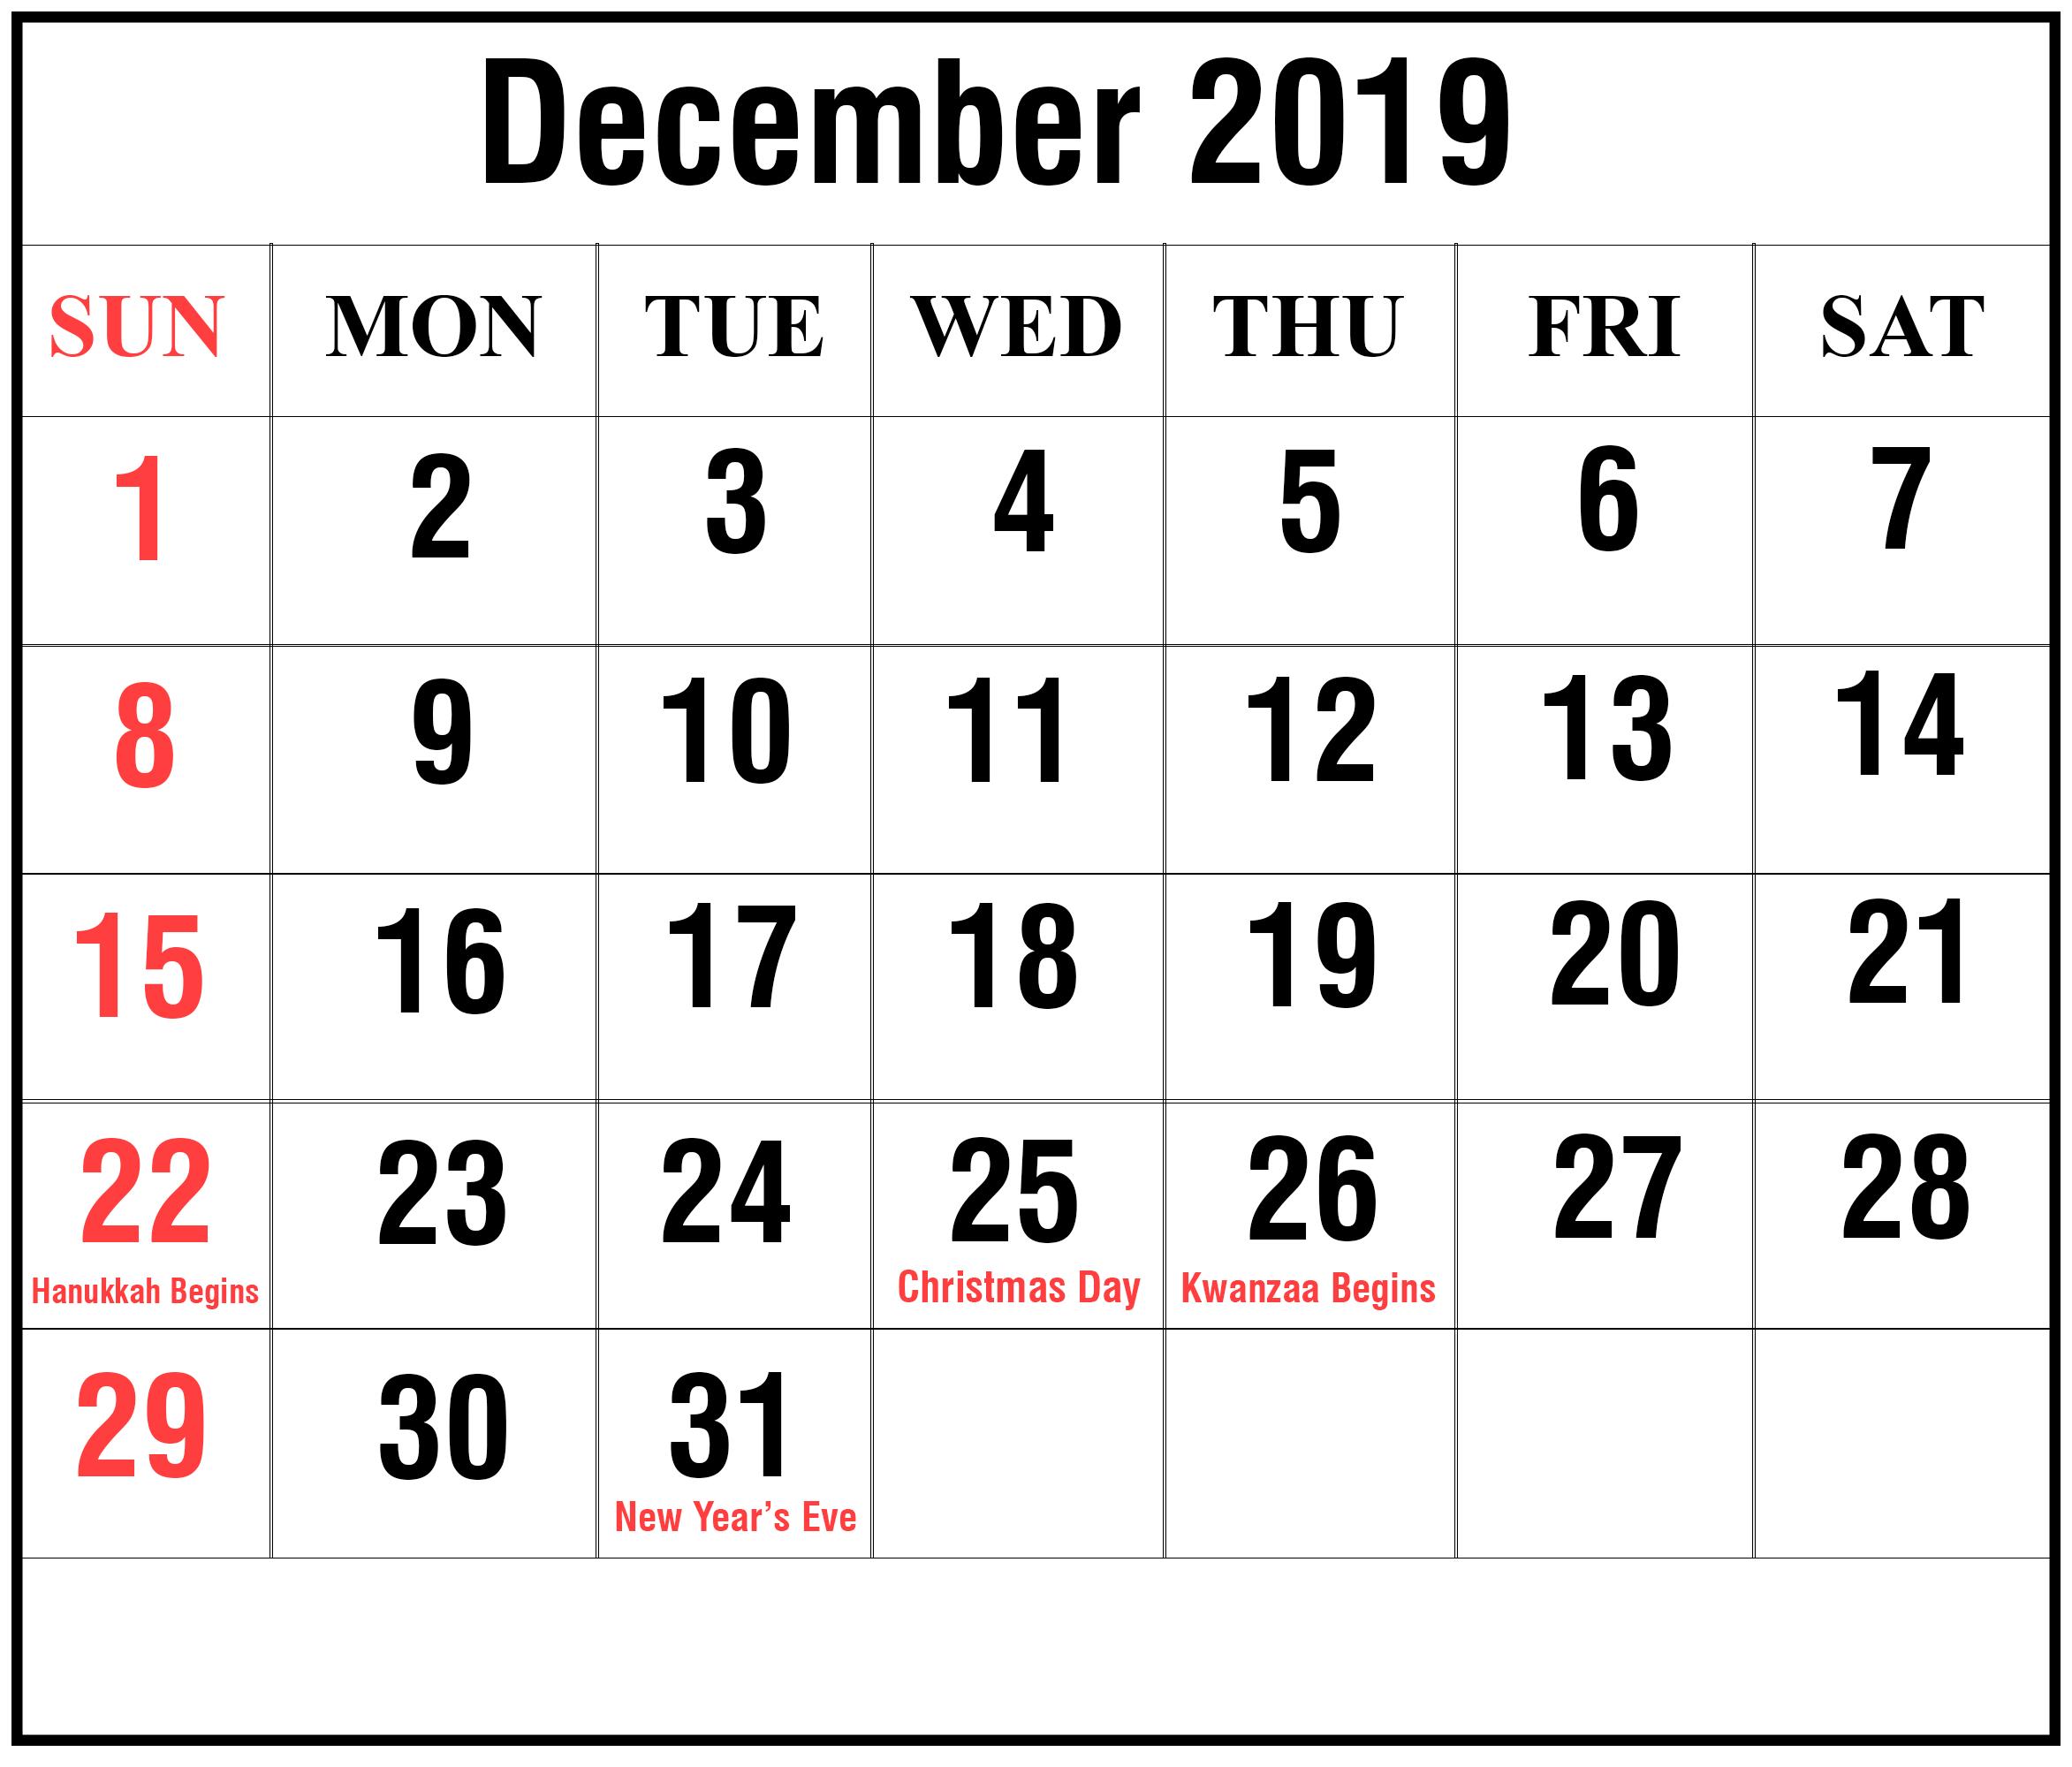 December 2019 Holidays Calendar